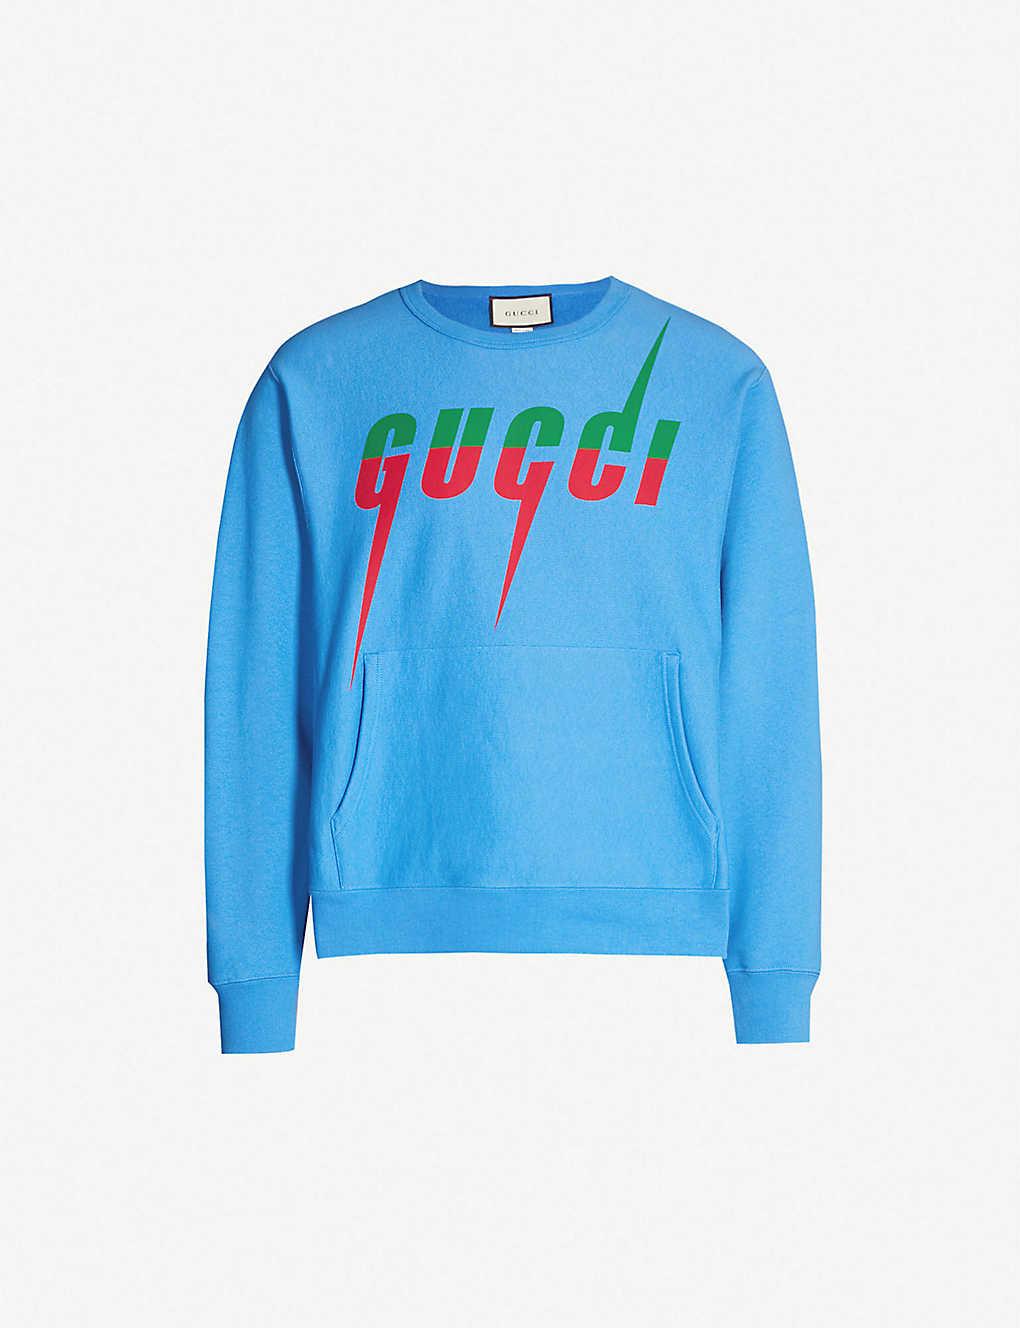 41396aaa0 GUCCI - Logo-print cotton-jersey sweatshirt | Selfridges.com